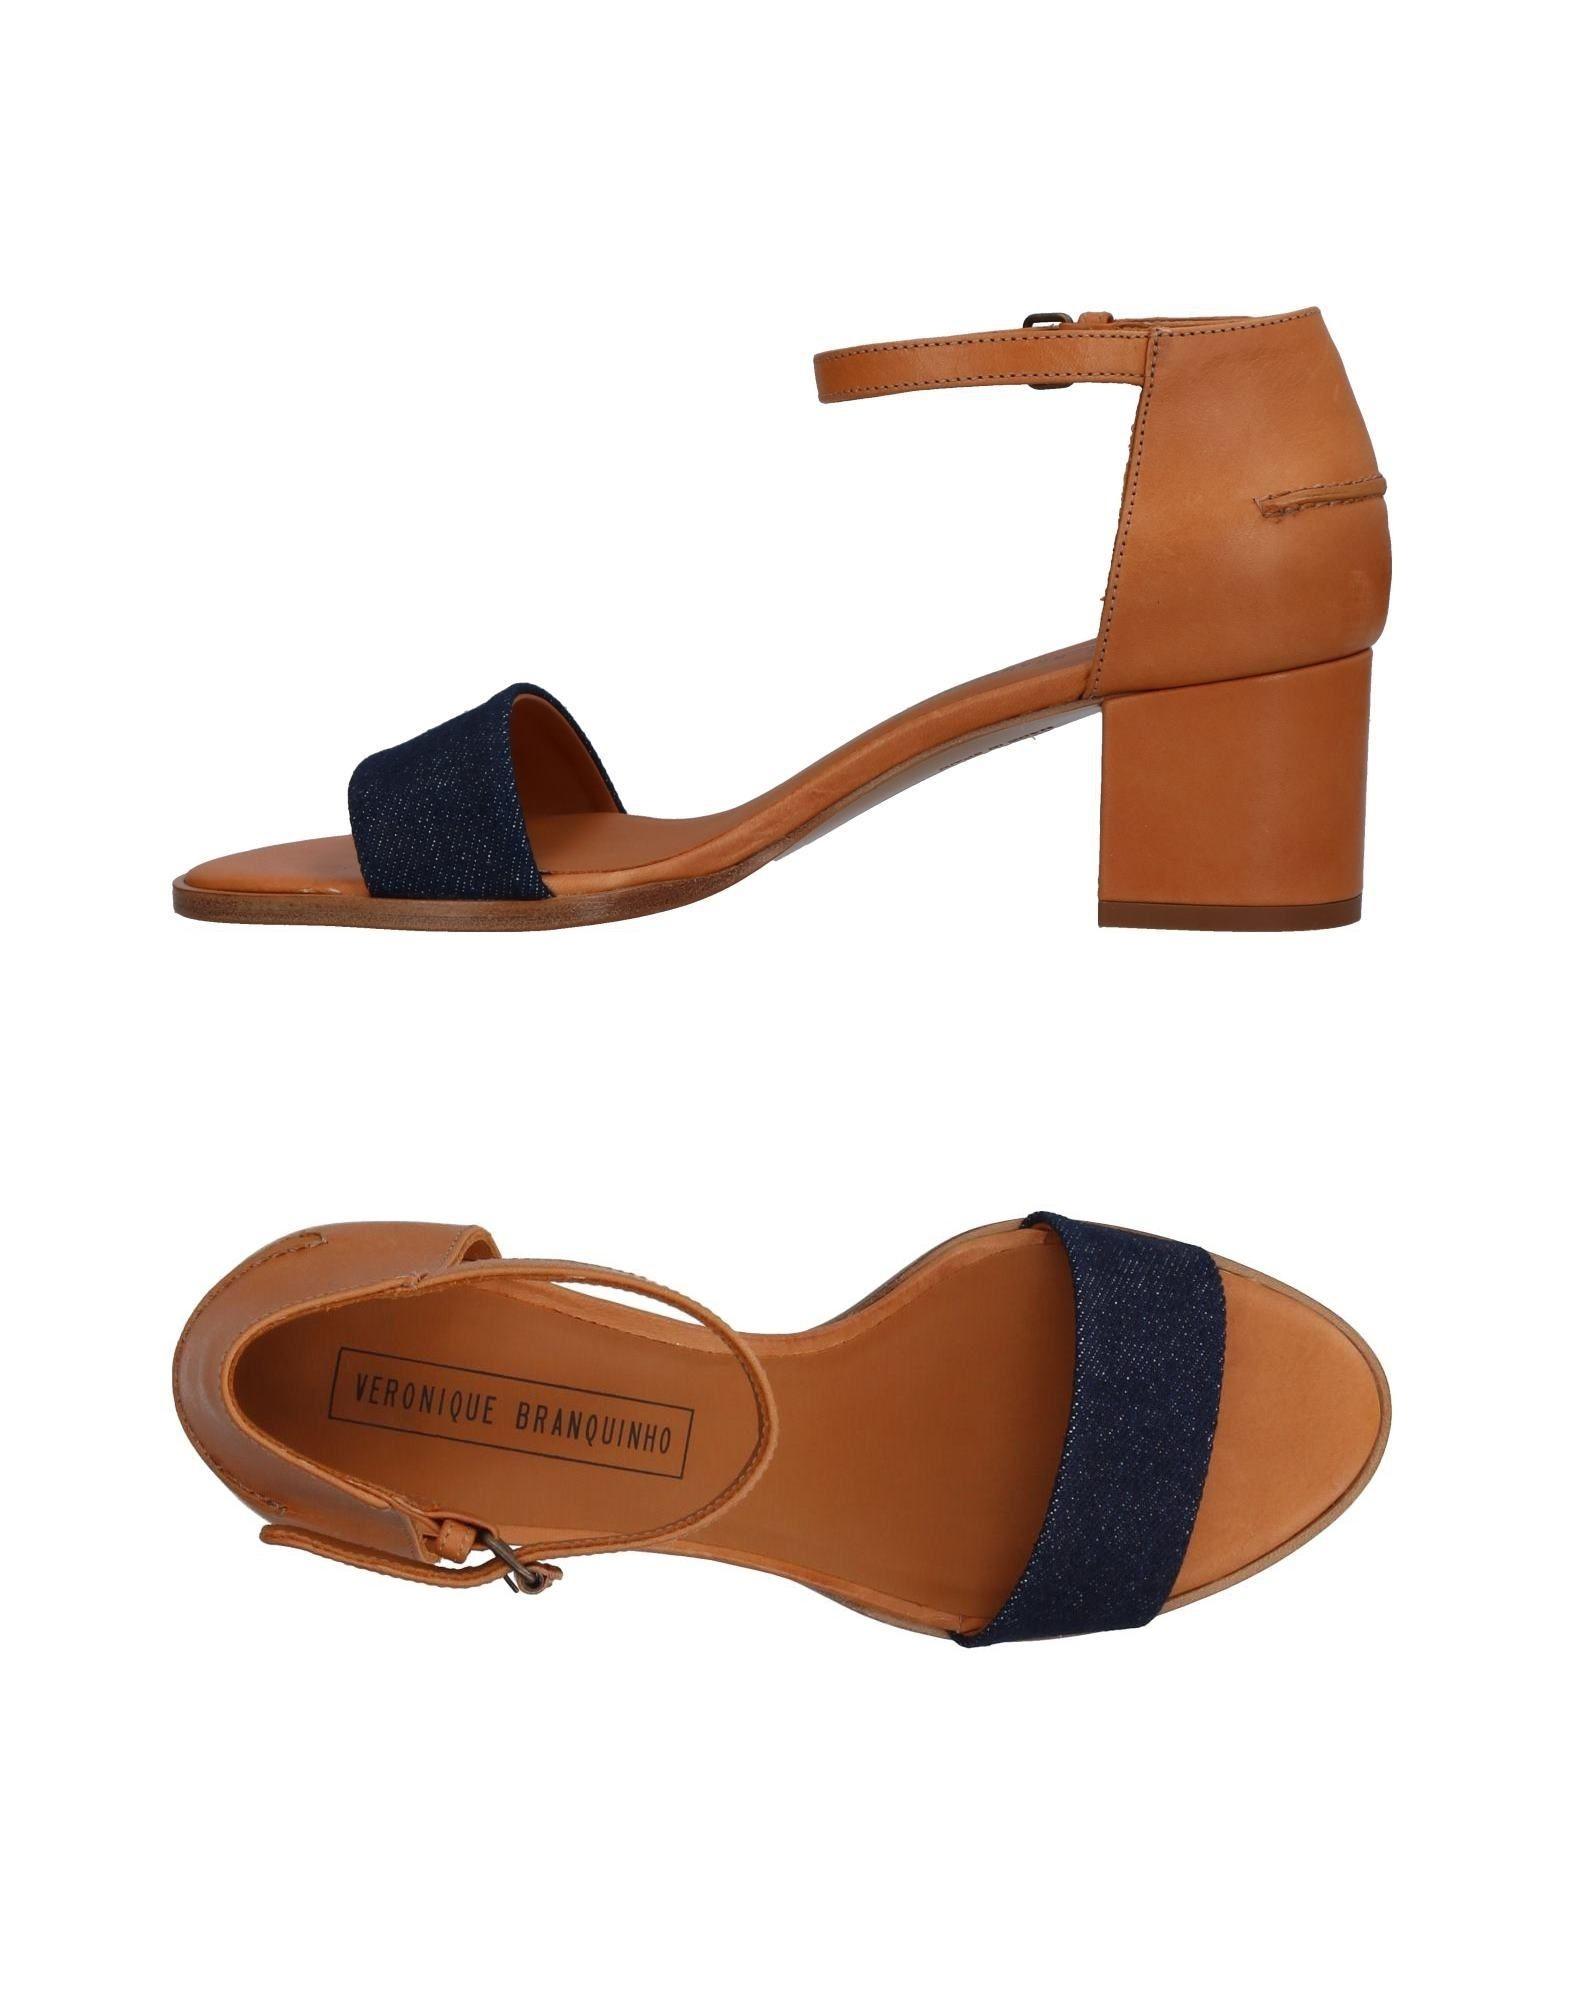 Veronique Veronique Veronique Branquinho Sandalen Damen  11400189IQ Gute Qualität beliebte Schuhe fce17e